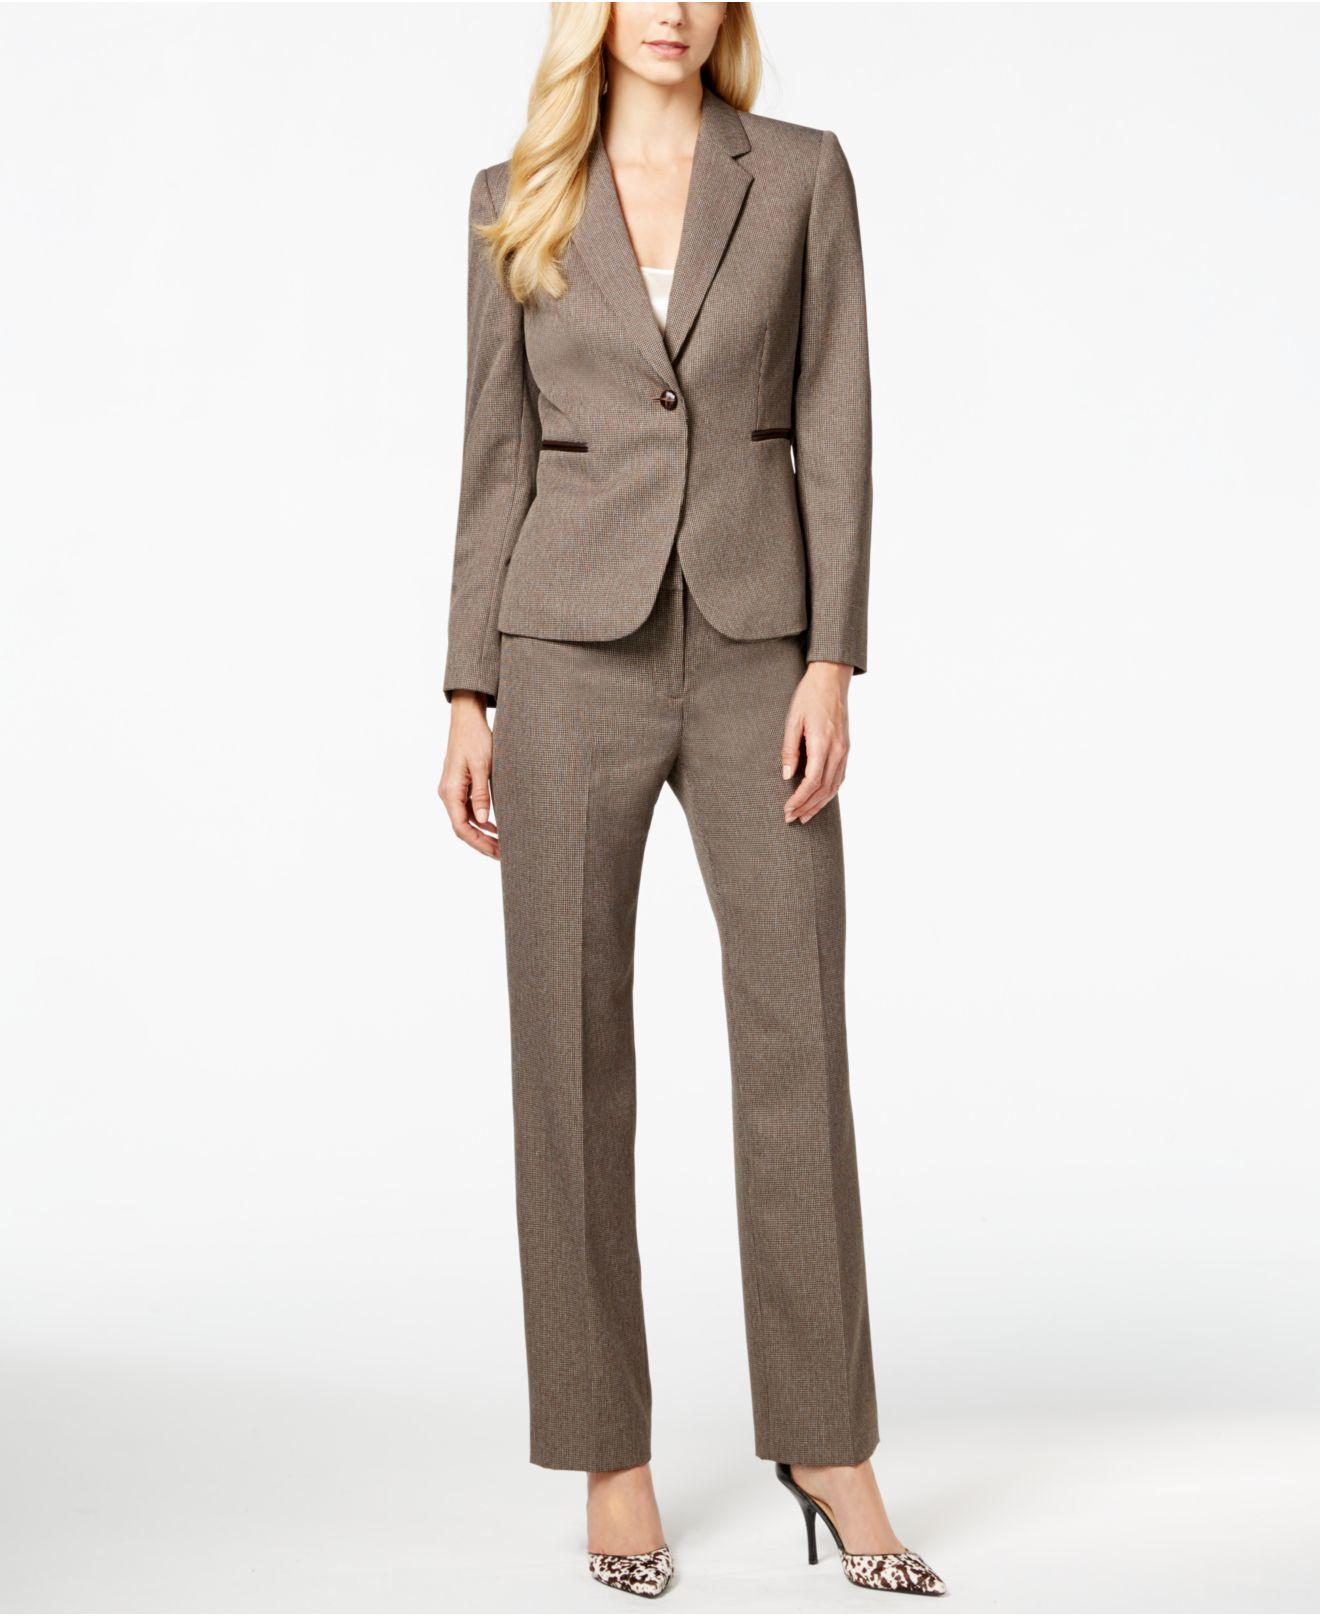 Petite Women S Professional Clothing